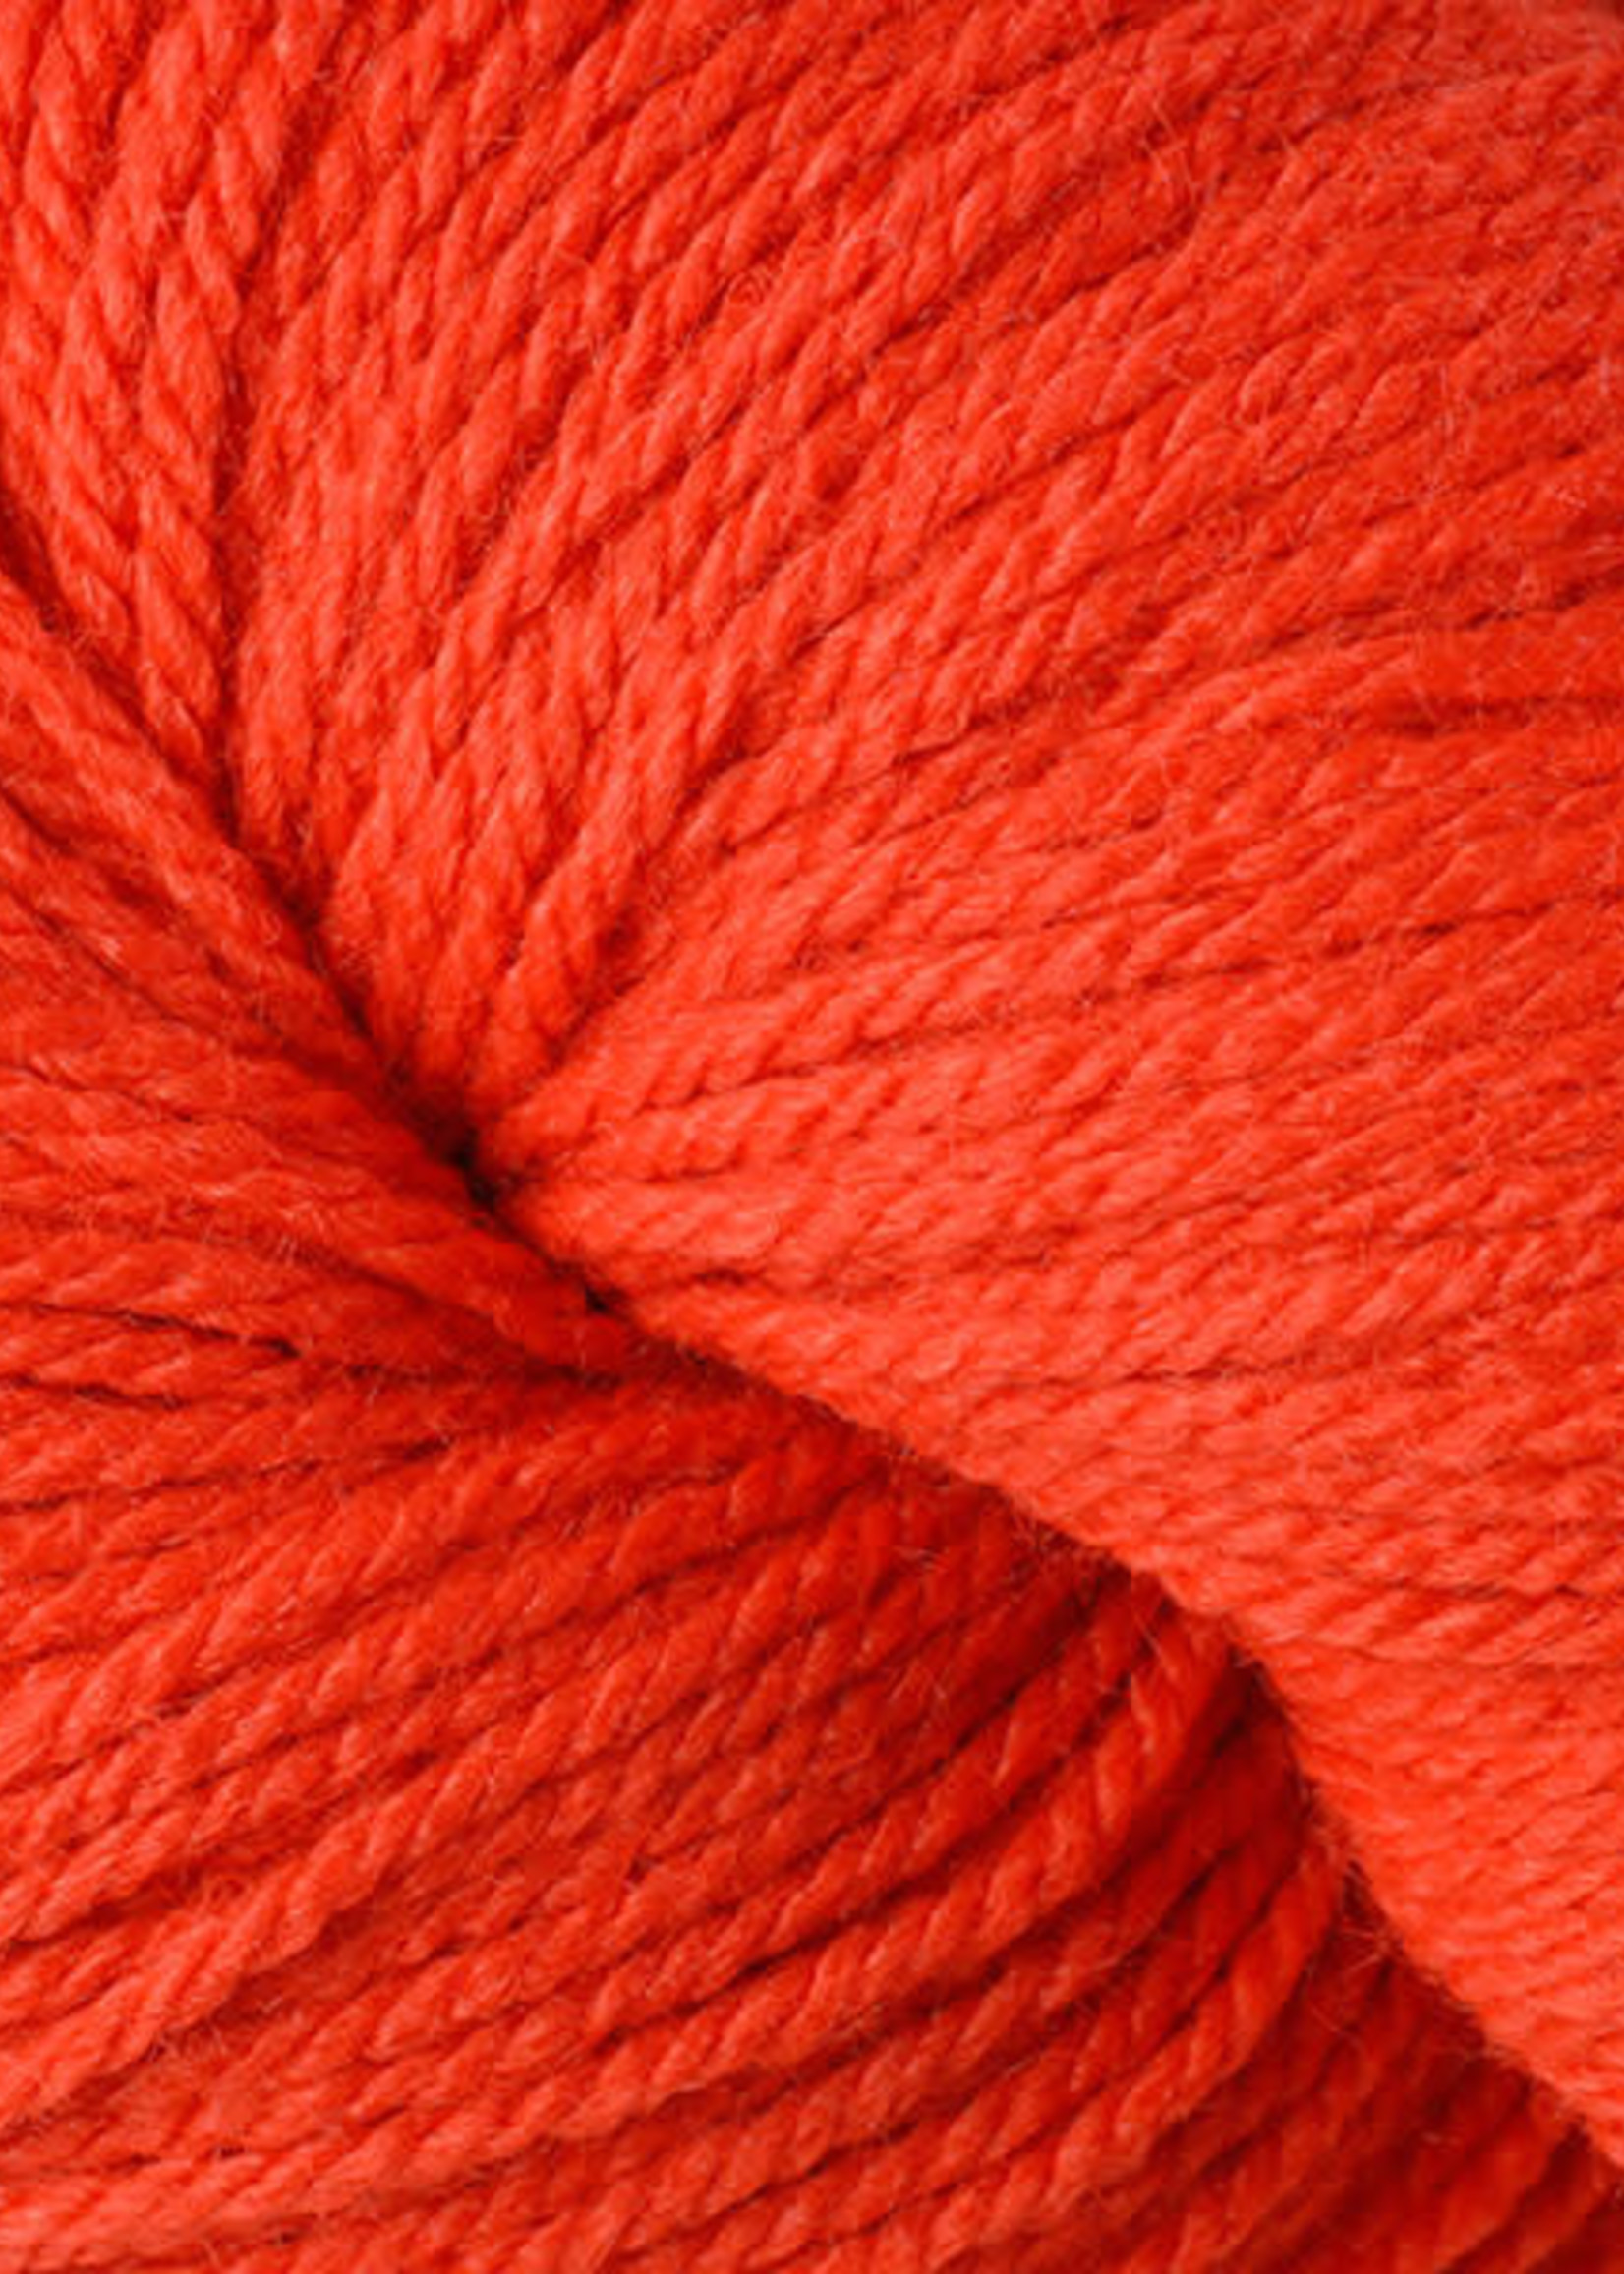 Berroco Berroco Vintage DK Yarn #2140 Orange